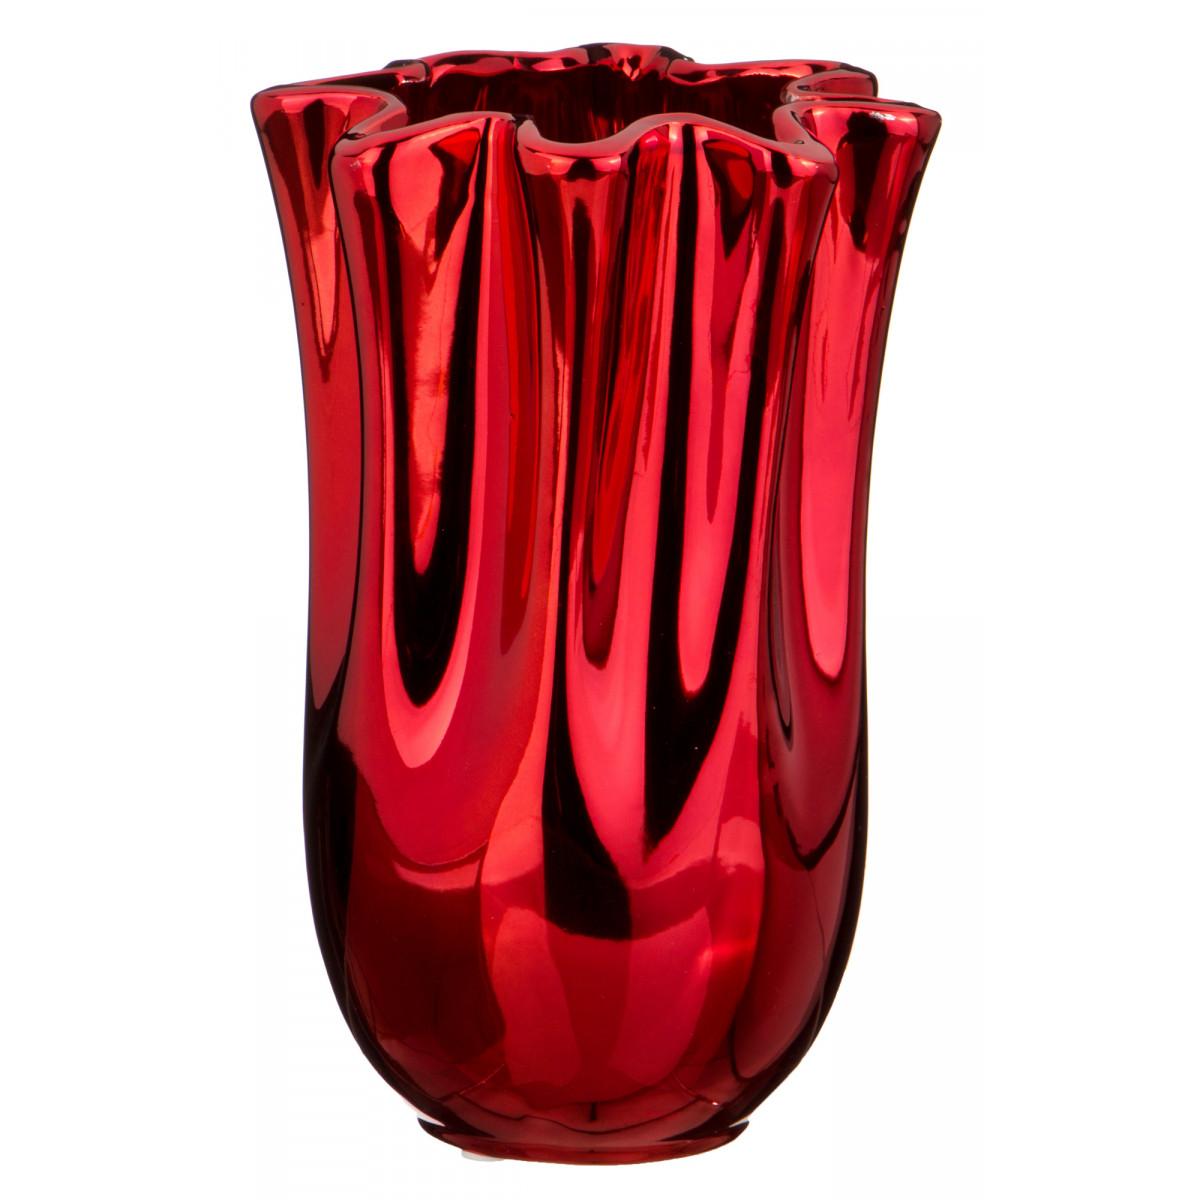 Купить Вазы Lefard, Ваза Adriannah (14х14х22 см), Китай, Красный, Керамика